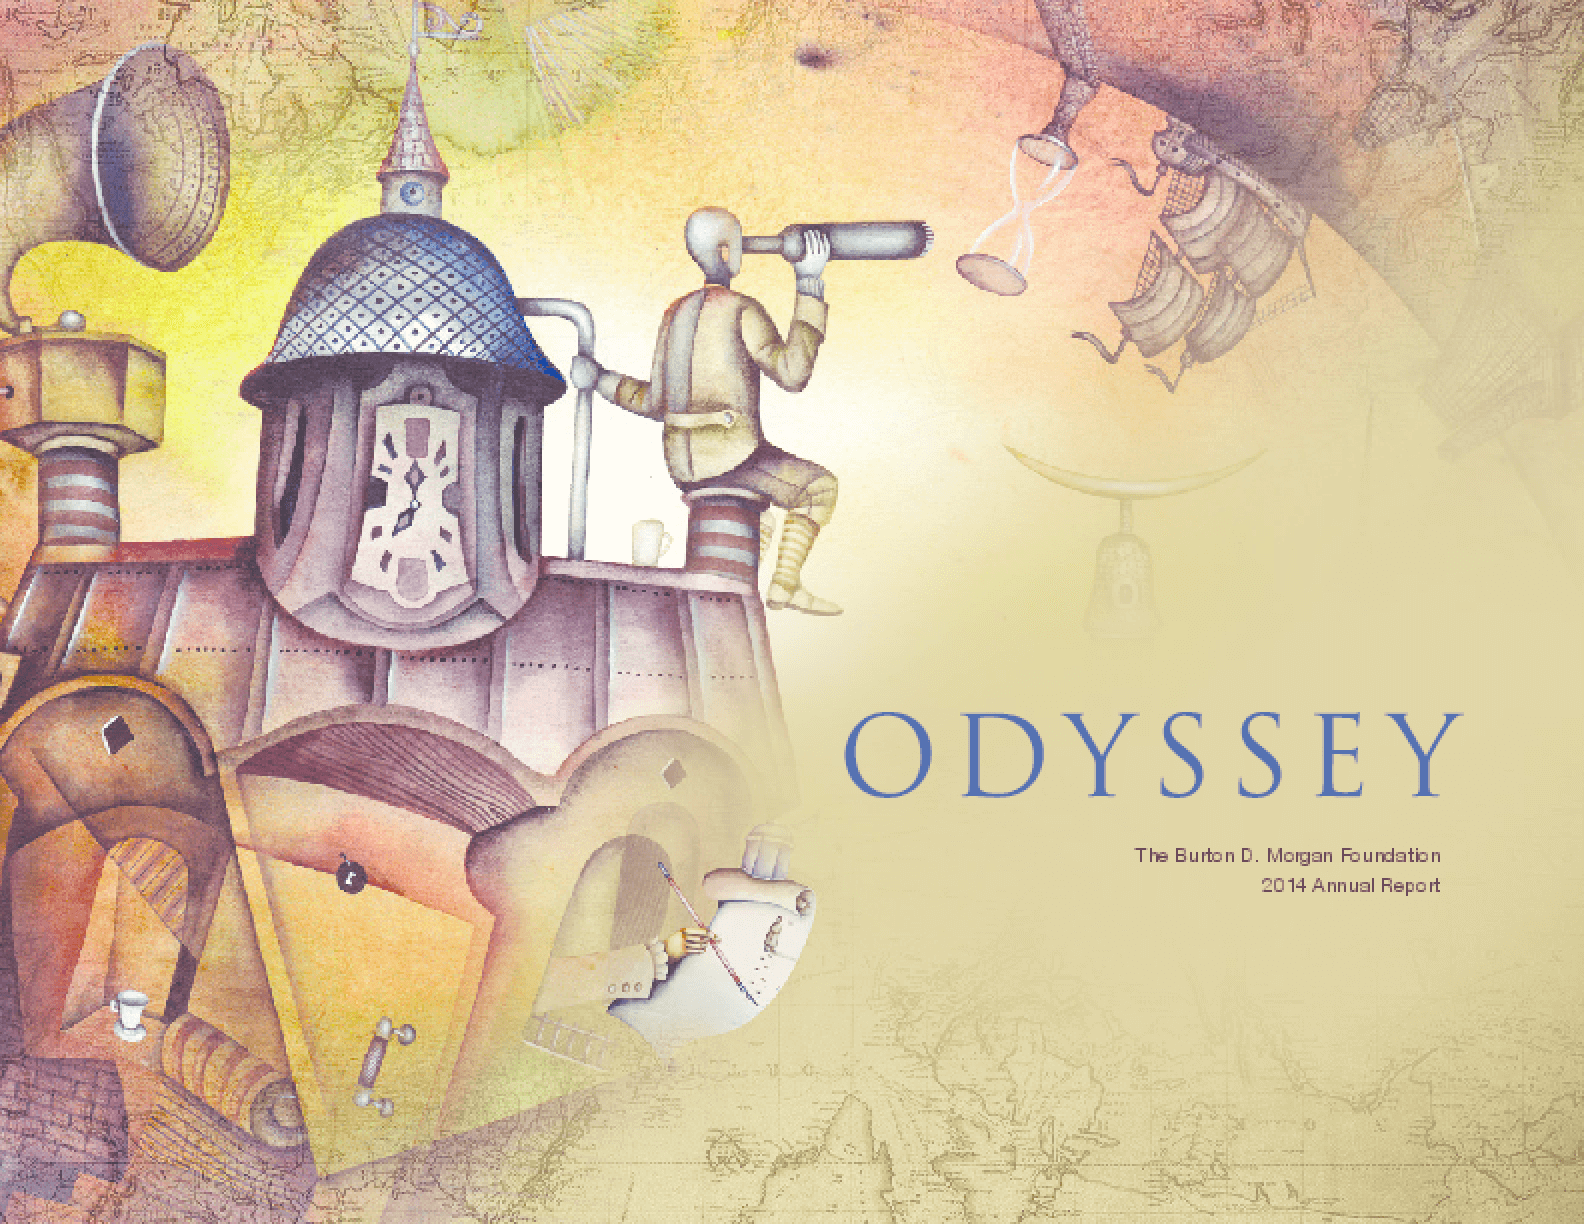 Odyssey: The Burton D. Morgan Foundation 2014 Annual Report